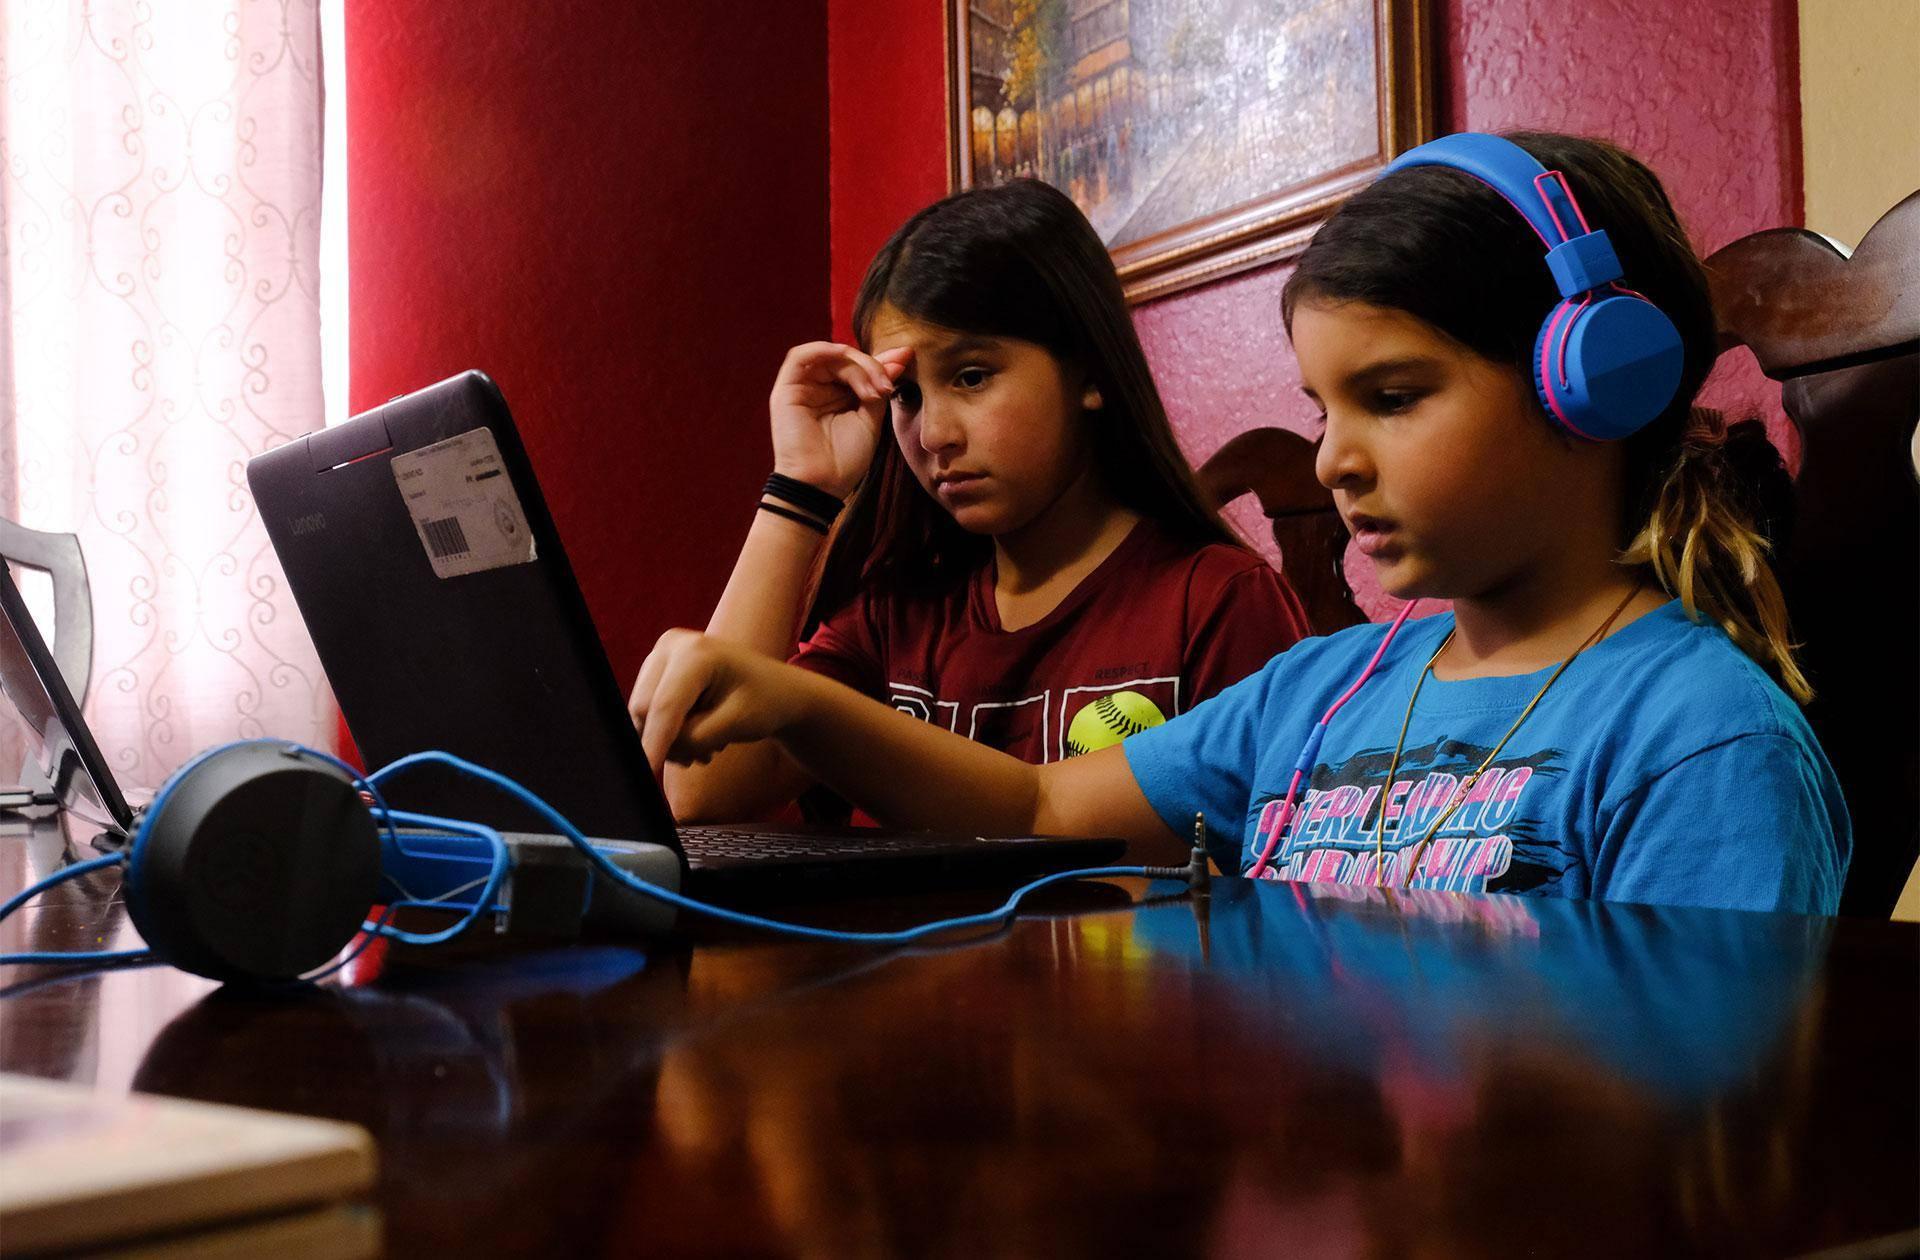 UAE: Stranded Indian students desperate to return